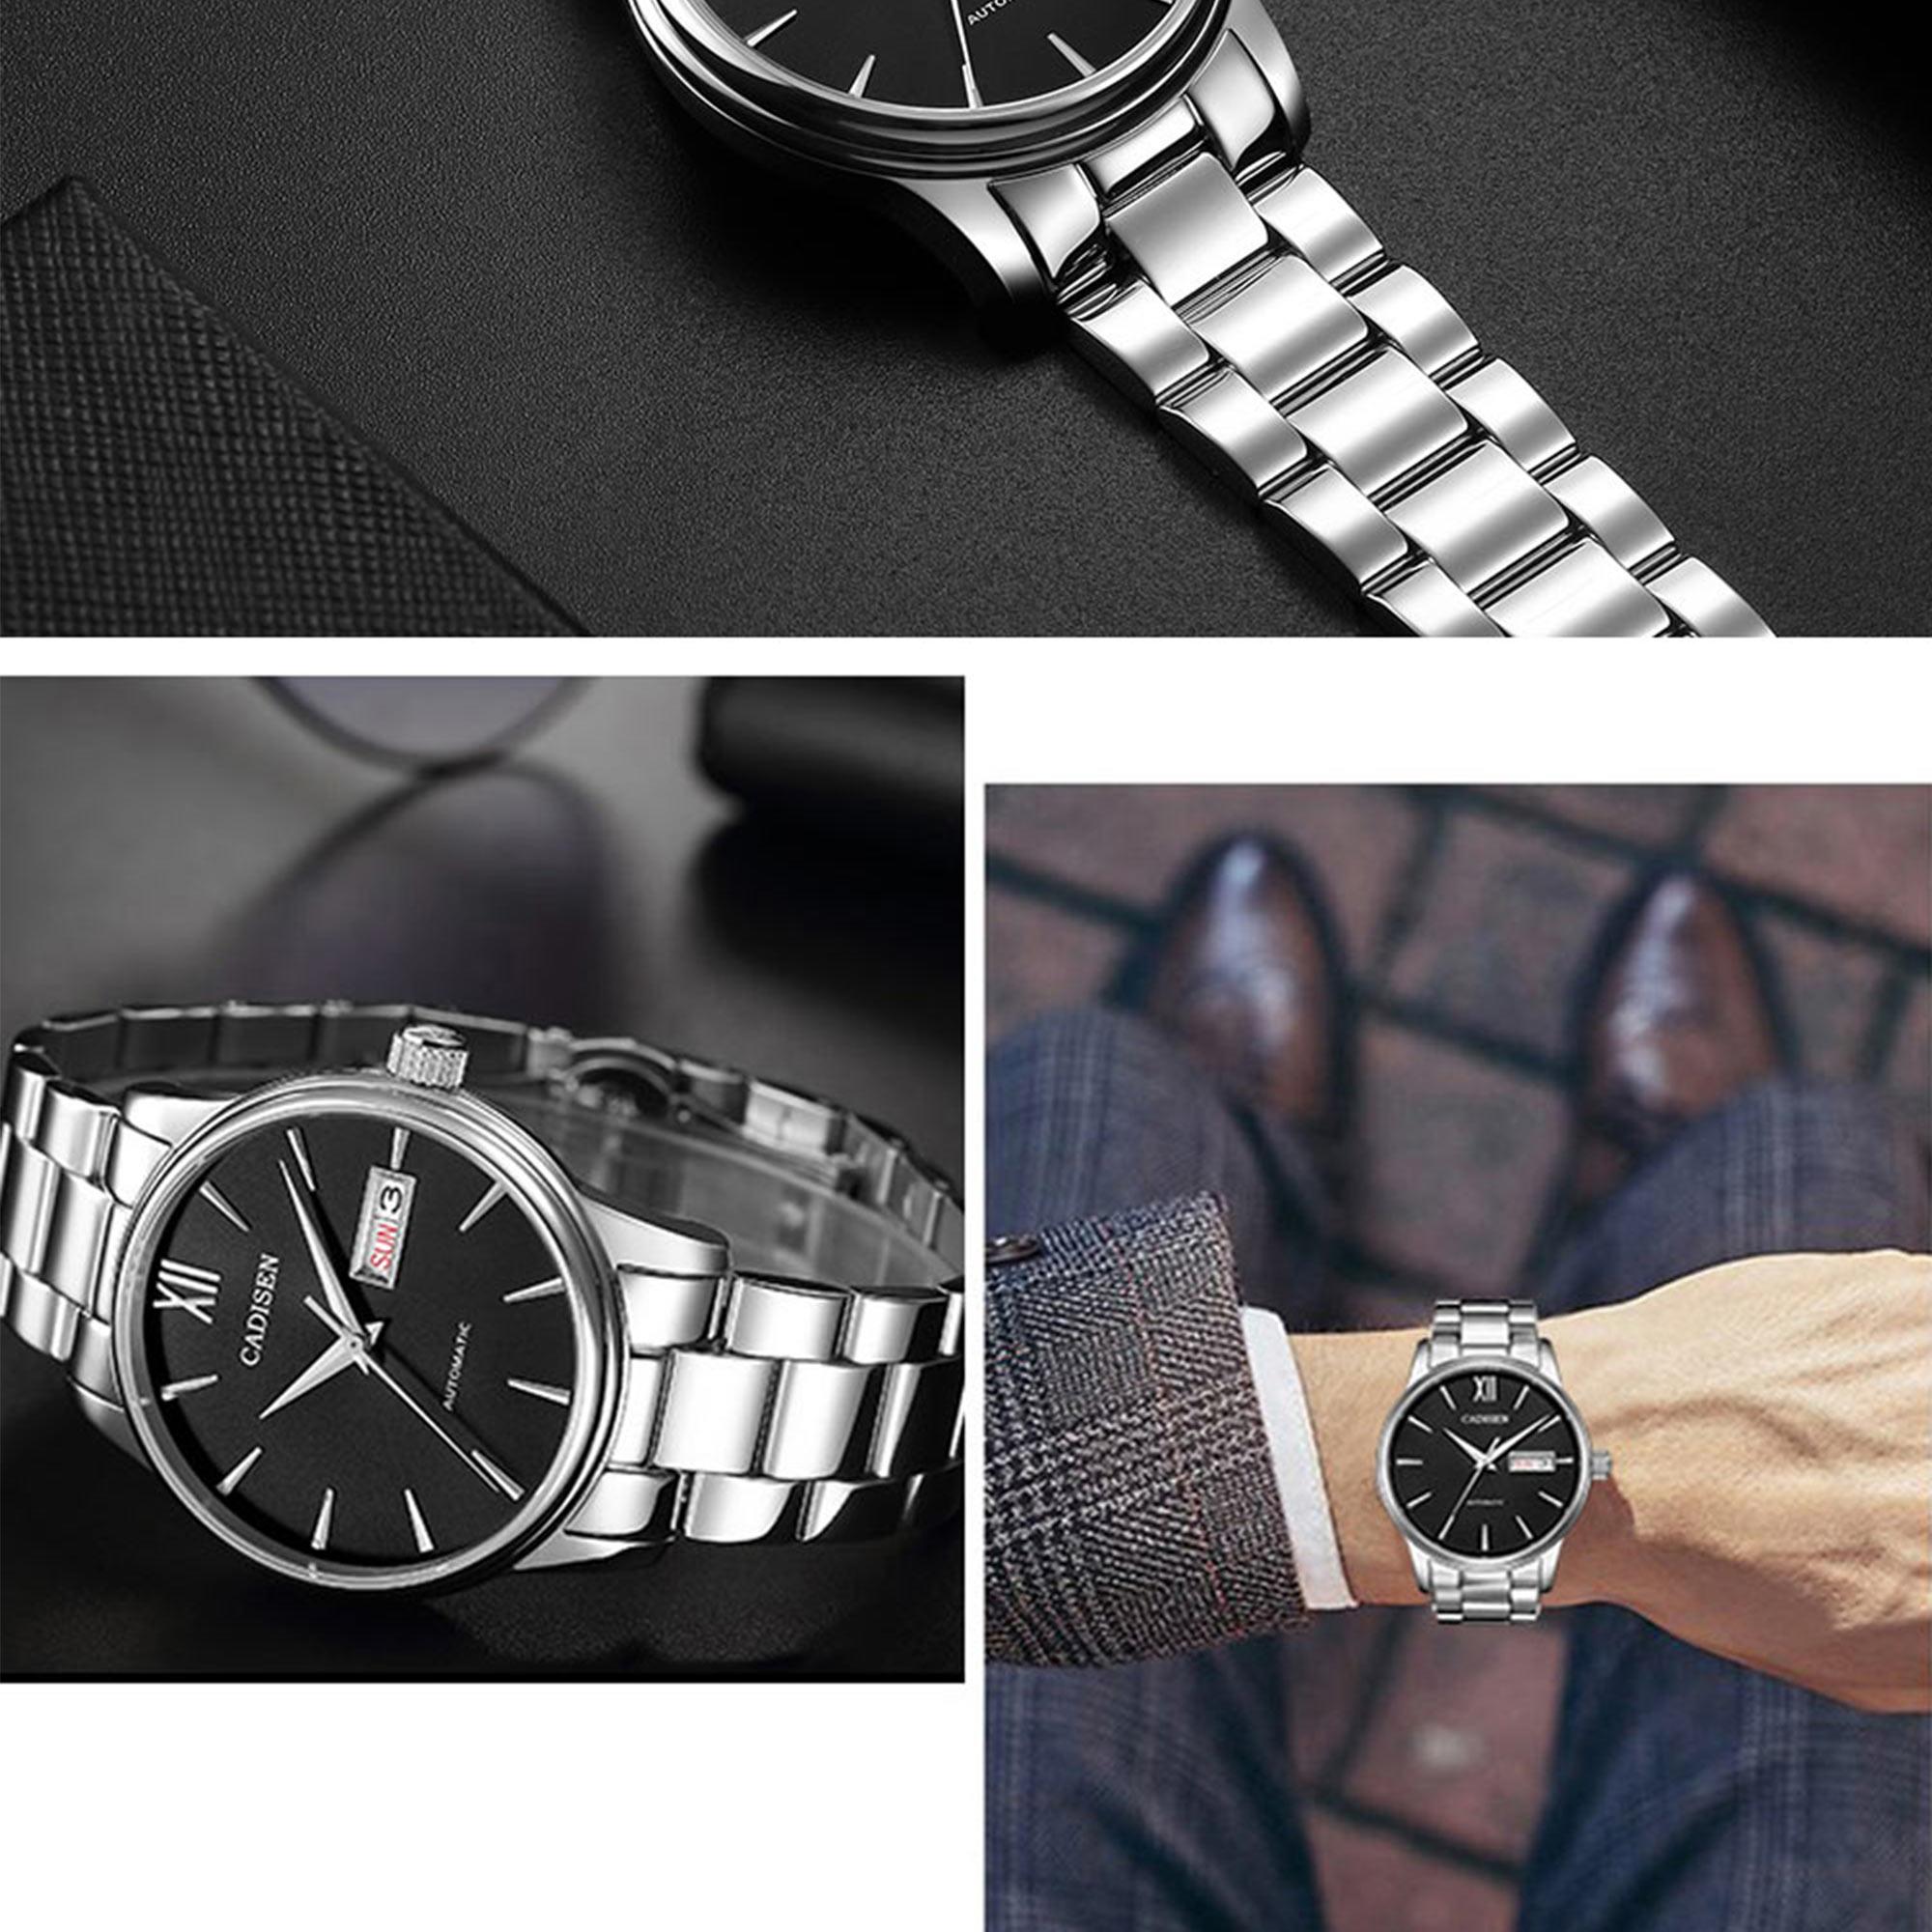 Hf5cafaa93c704ba5ae31e5990d579b970 CADISEN Men Watch Automatic Mechanical Watches Role Date Week Top Luxury Brand Japan NH36A Wrist watch Clock Relogio Masculino